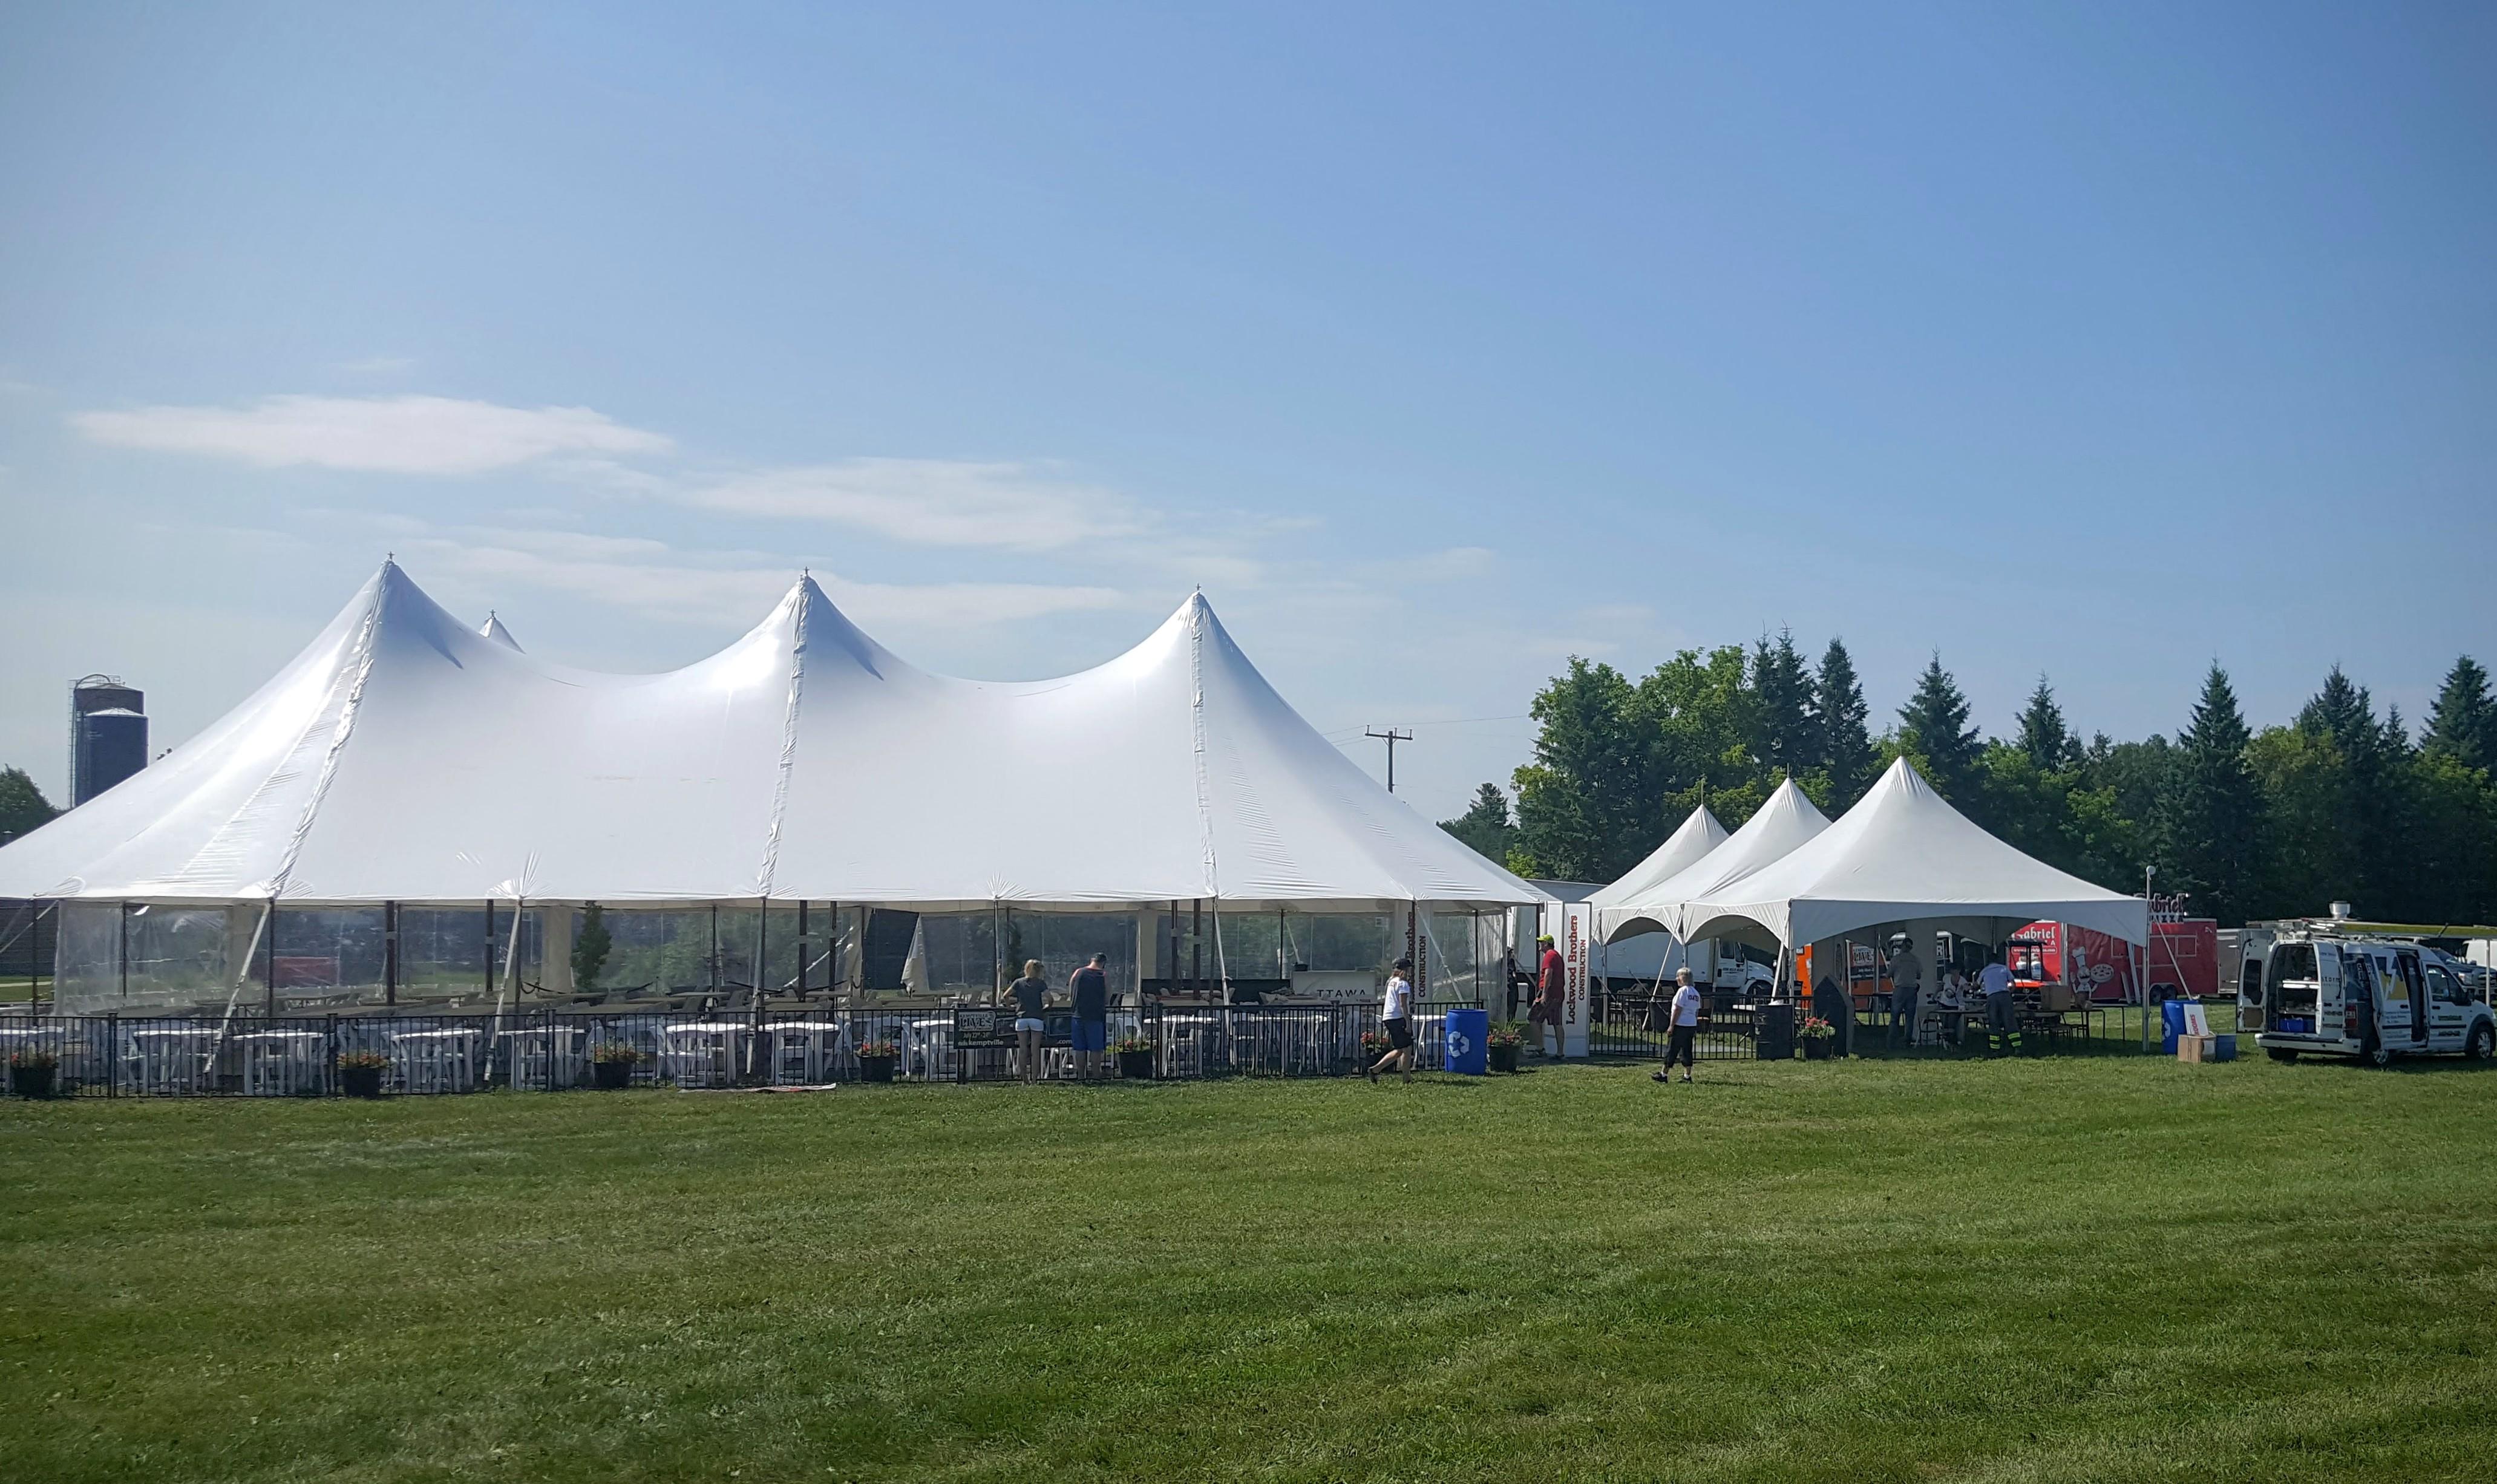 Photo Credit Drew Hosick - VIP Tent at Kemptville Live Music Festival & Kemptville Live Festival begins tonight - My Prescott Now